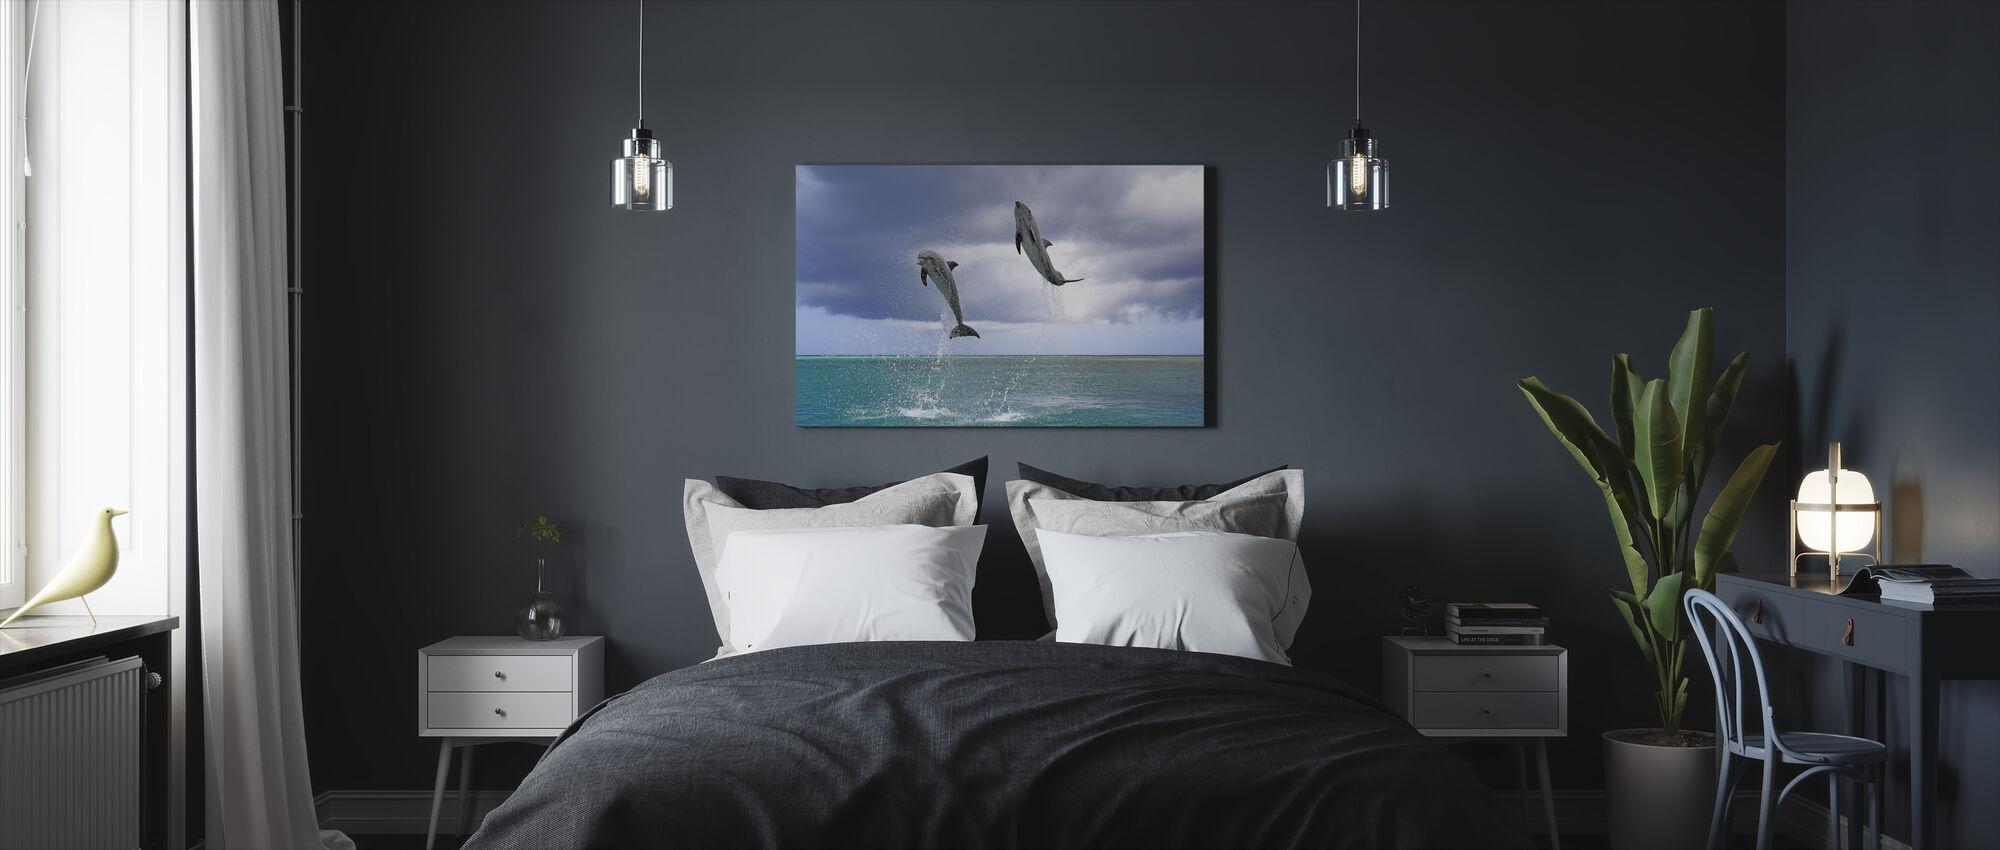 Jumping delfiinit - Canvastaulu - Makuuhuone